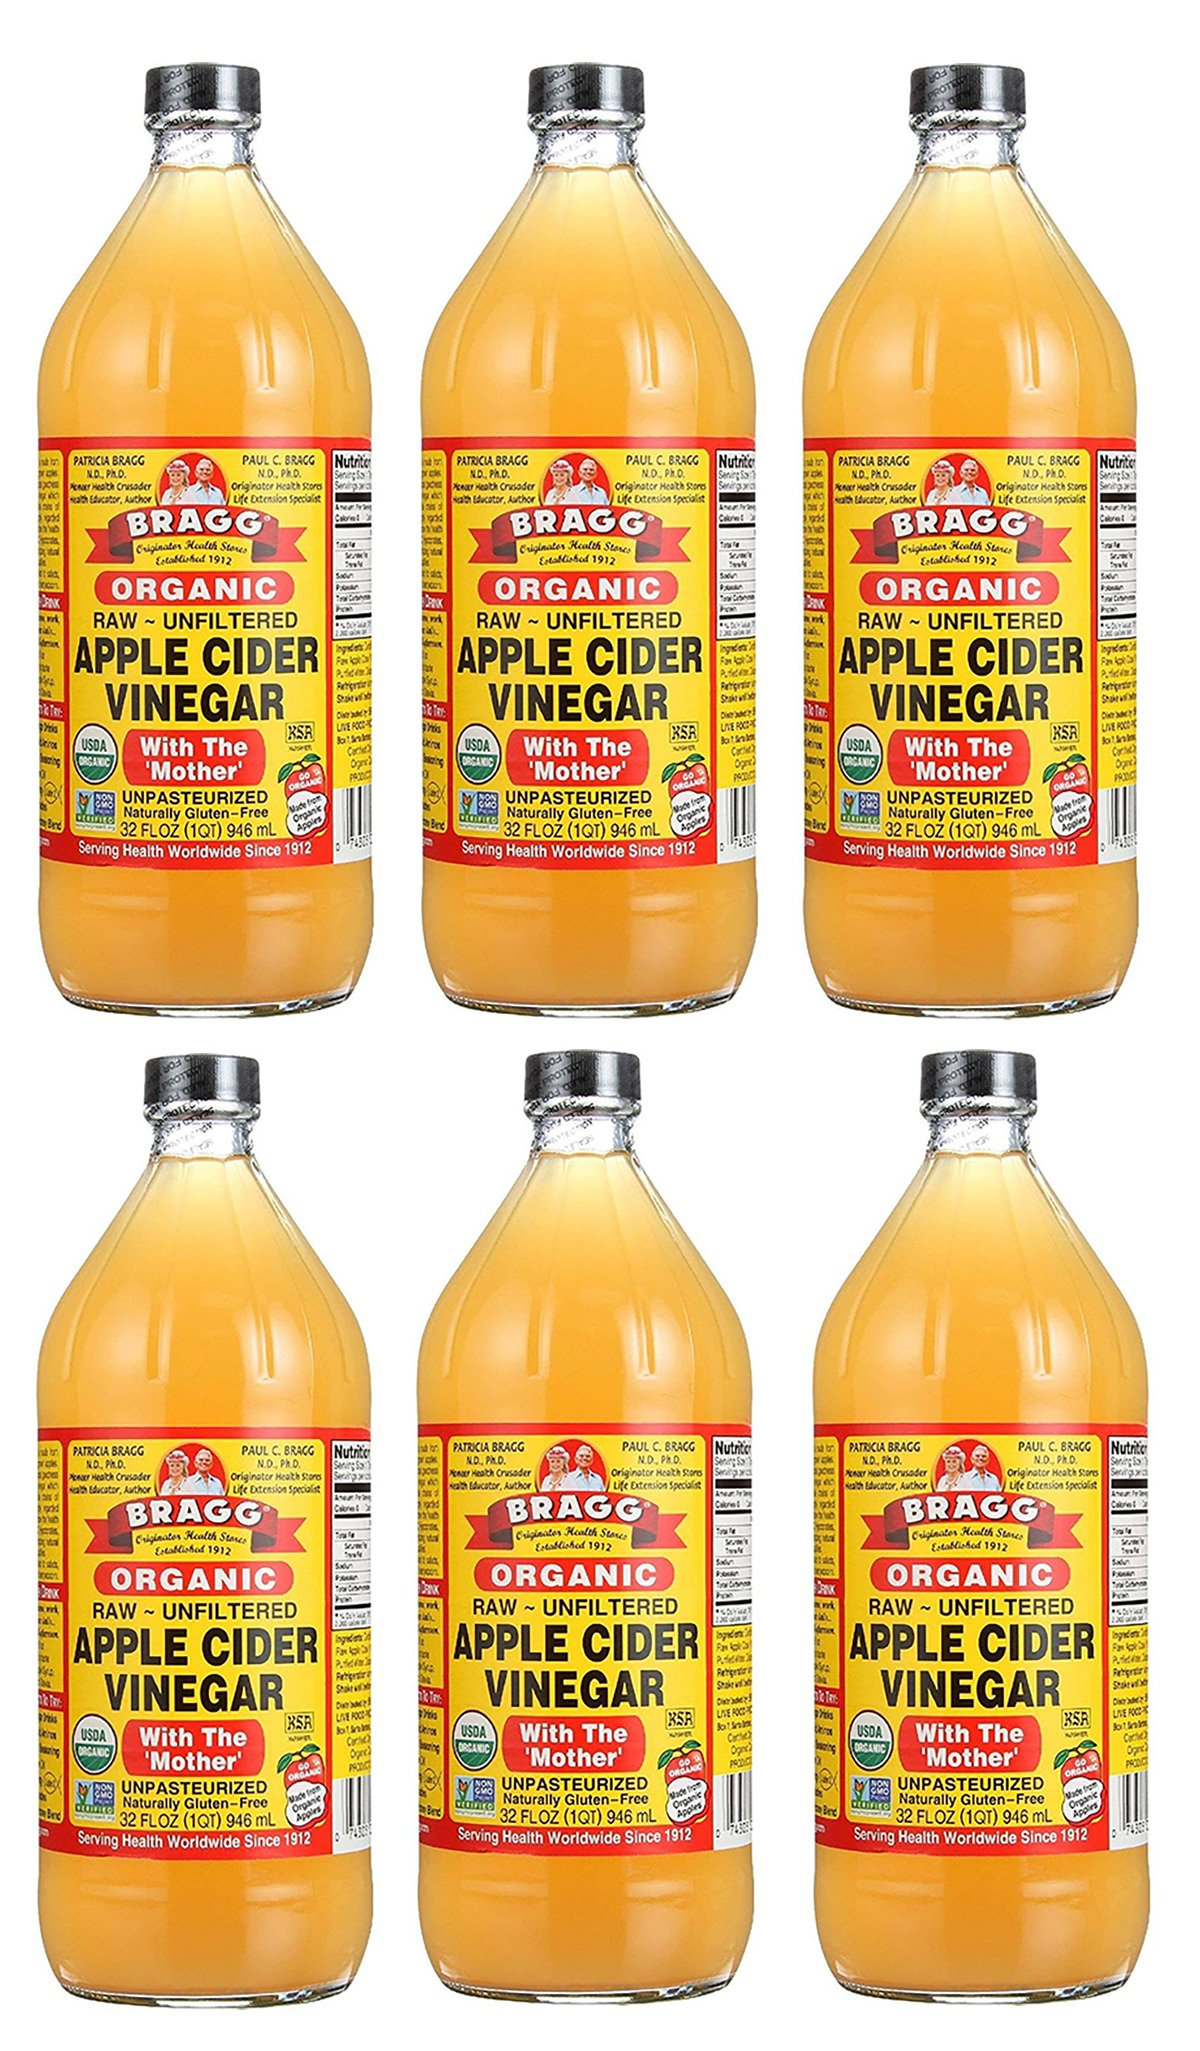 Bragg Usda Organic Raw Apple Cider Vinegar, 6 Pack